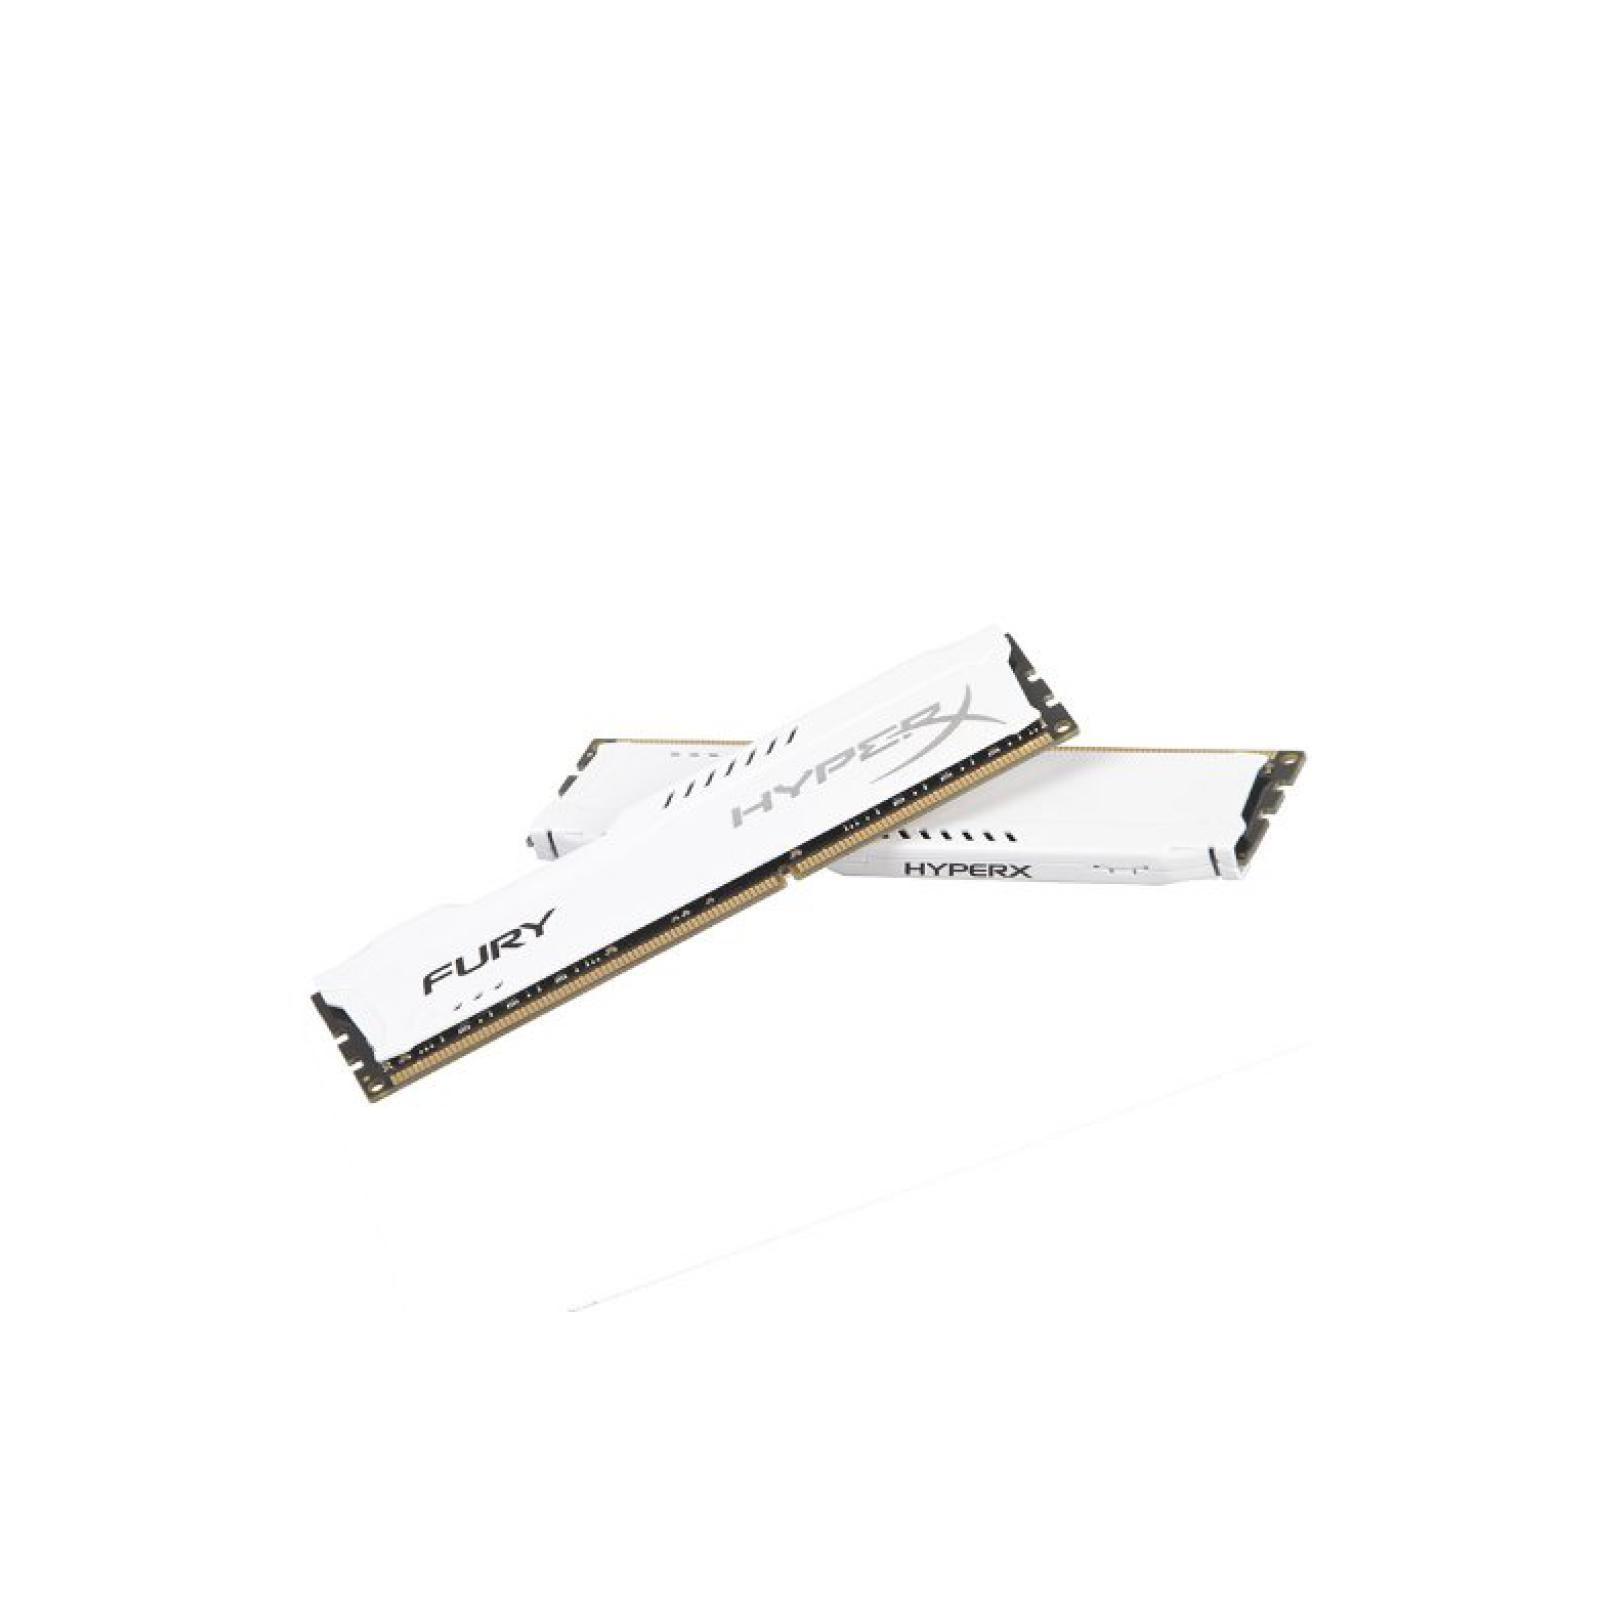 Модуль памяти для компьютера DDR4 16GB (2x8GB) 2933 MHz HyperX FURY White HyperX (Kingston Fury) (HX429C17FW2K2/16) изображение 4